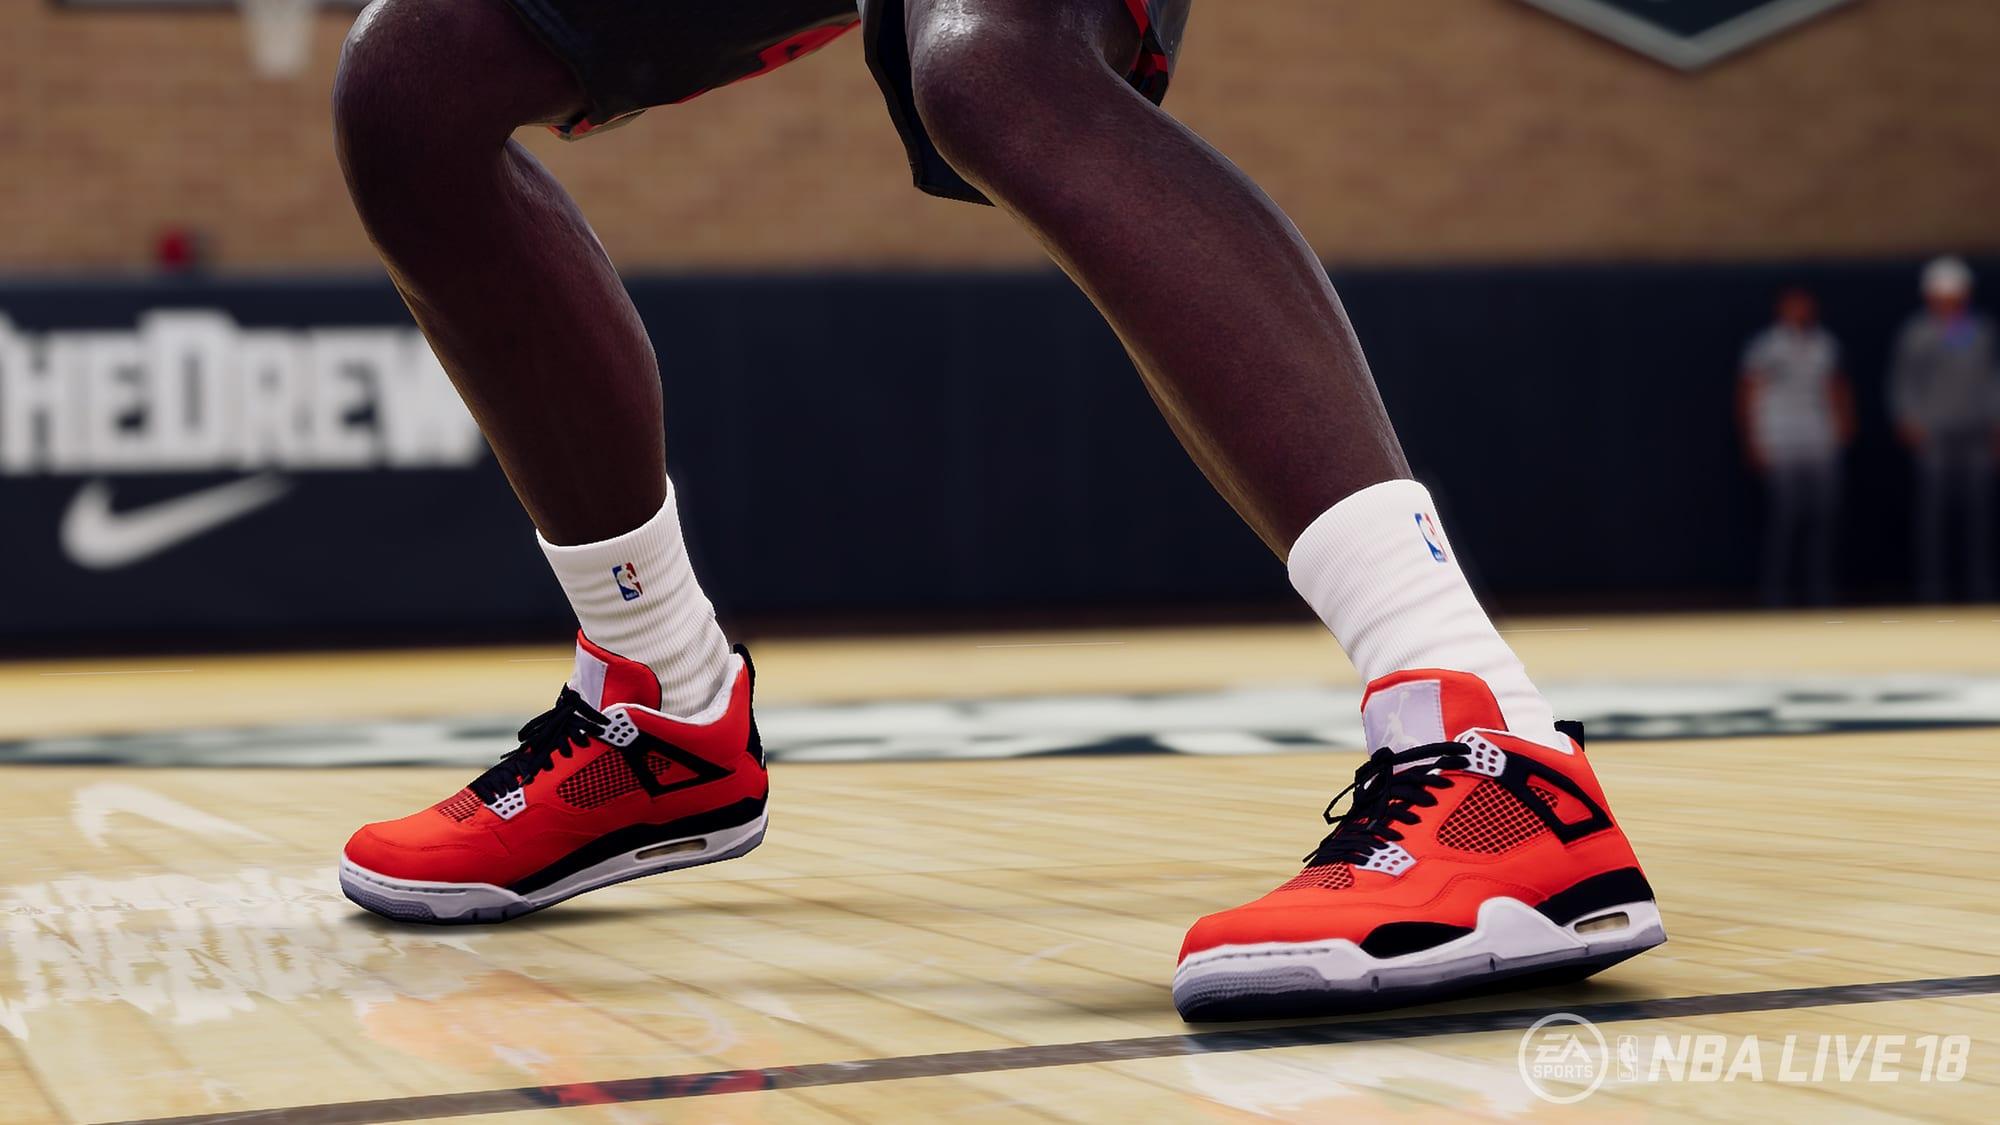 Jordan 4 NBA Live 18